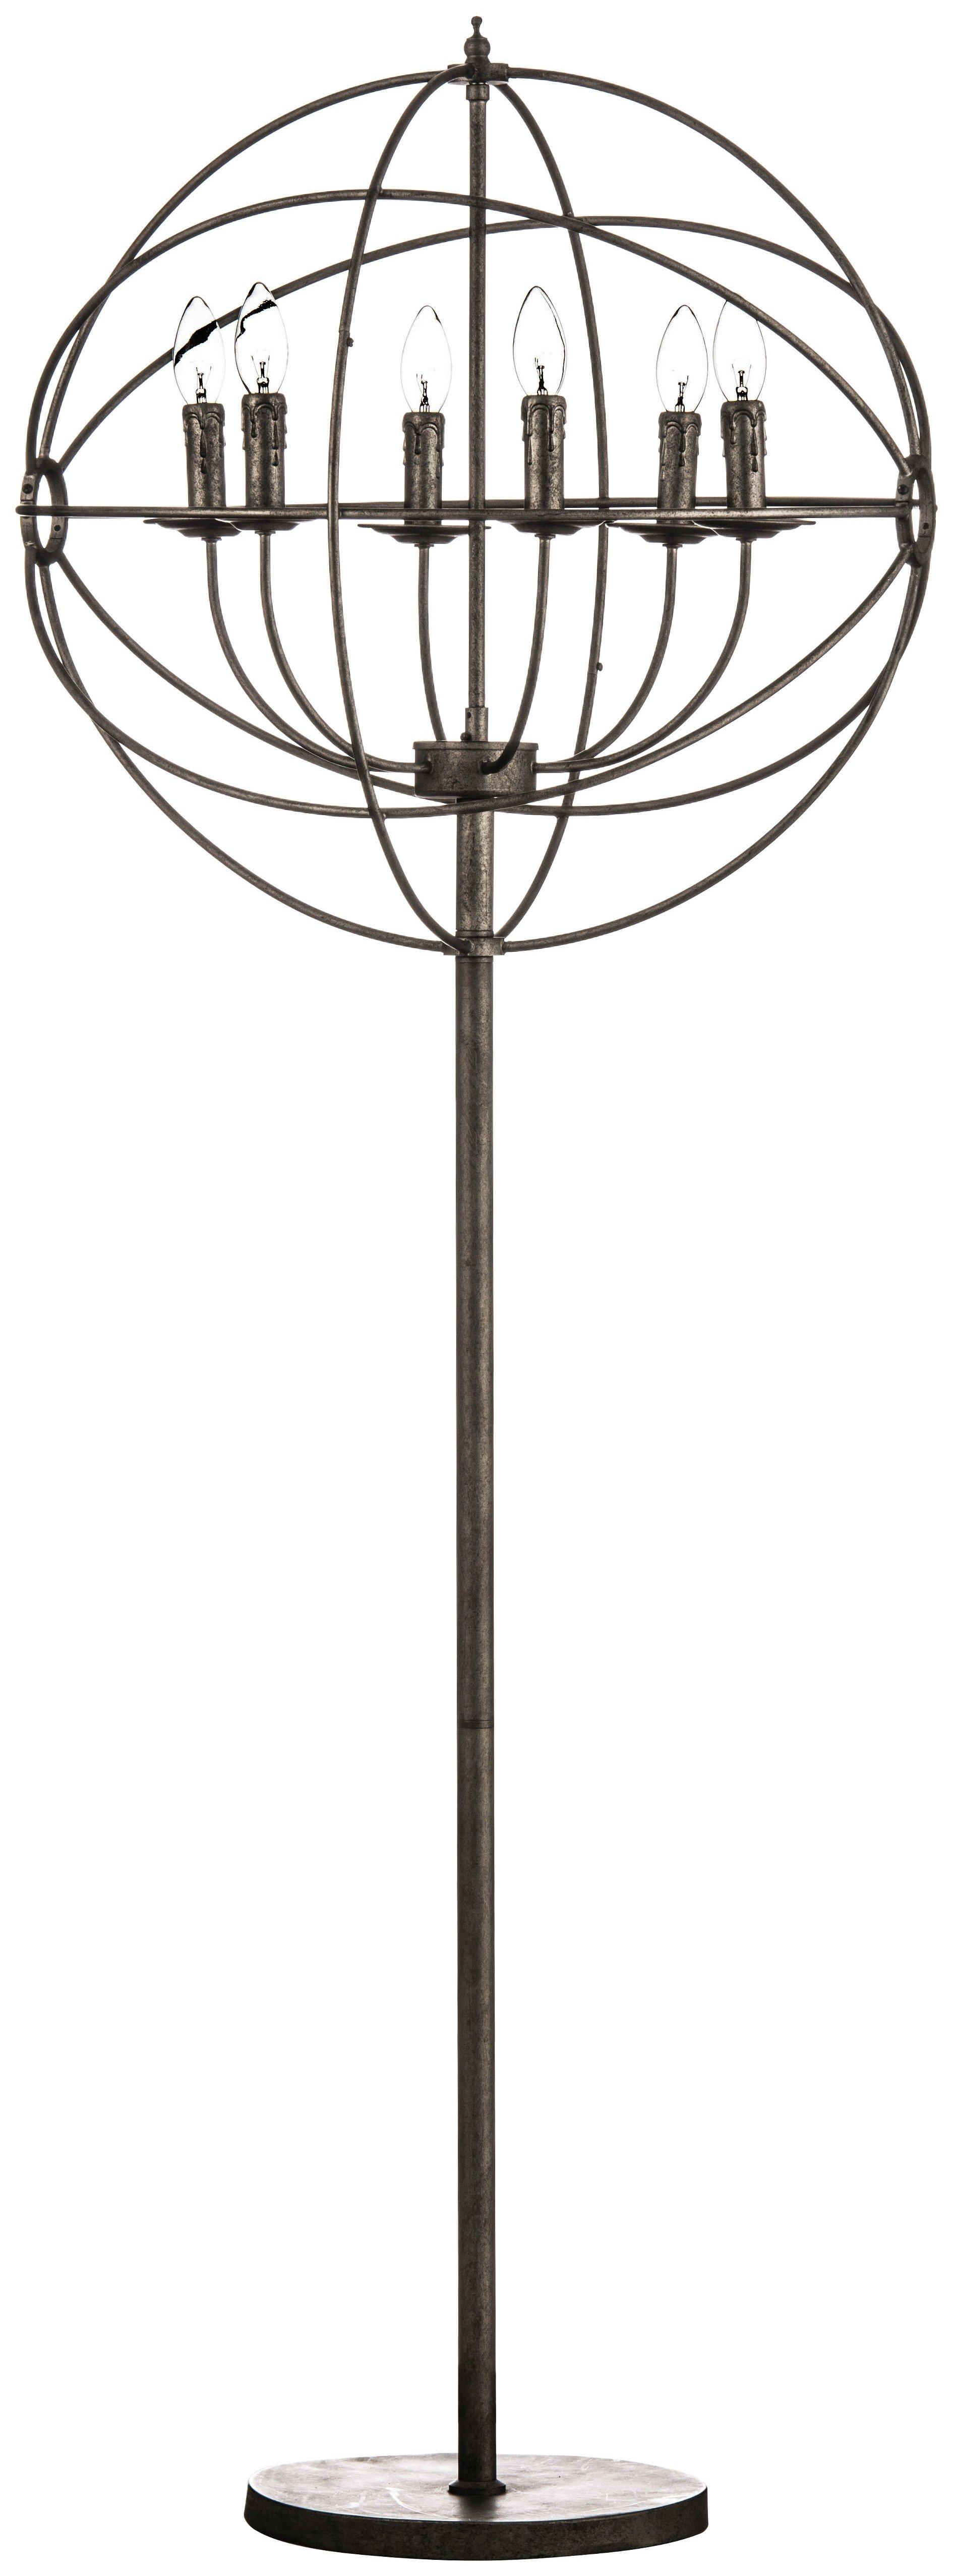 Image of Orbital 6 Arm Floor Lamp.